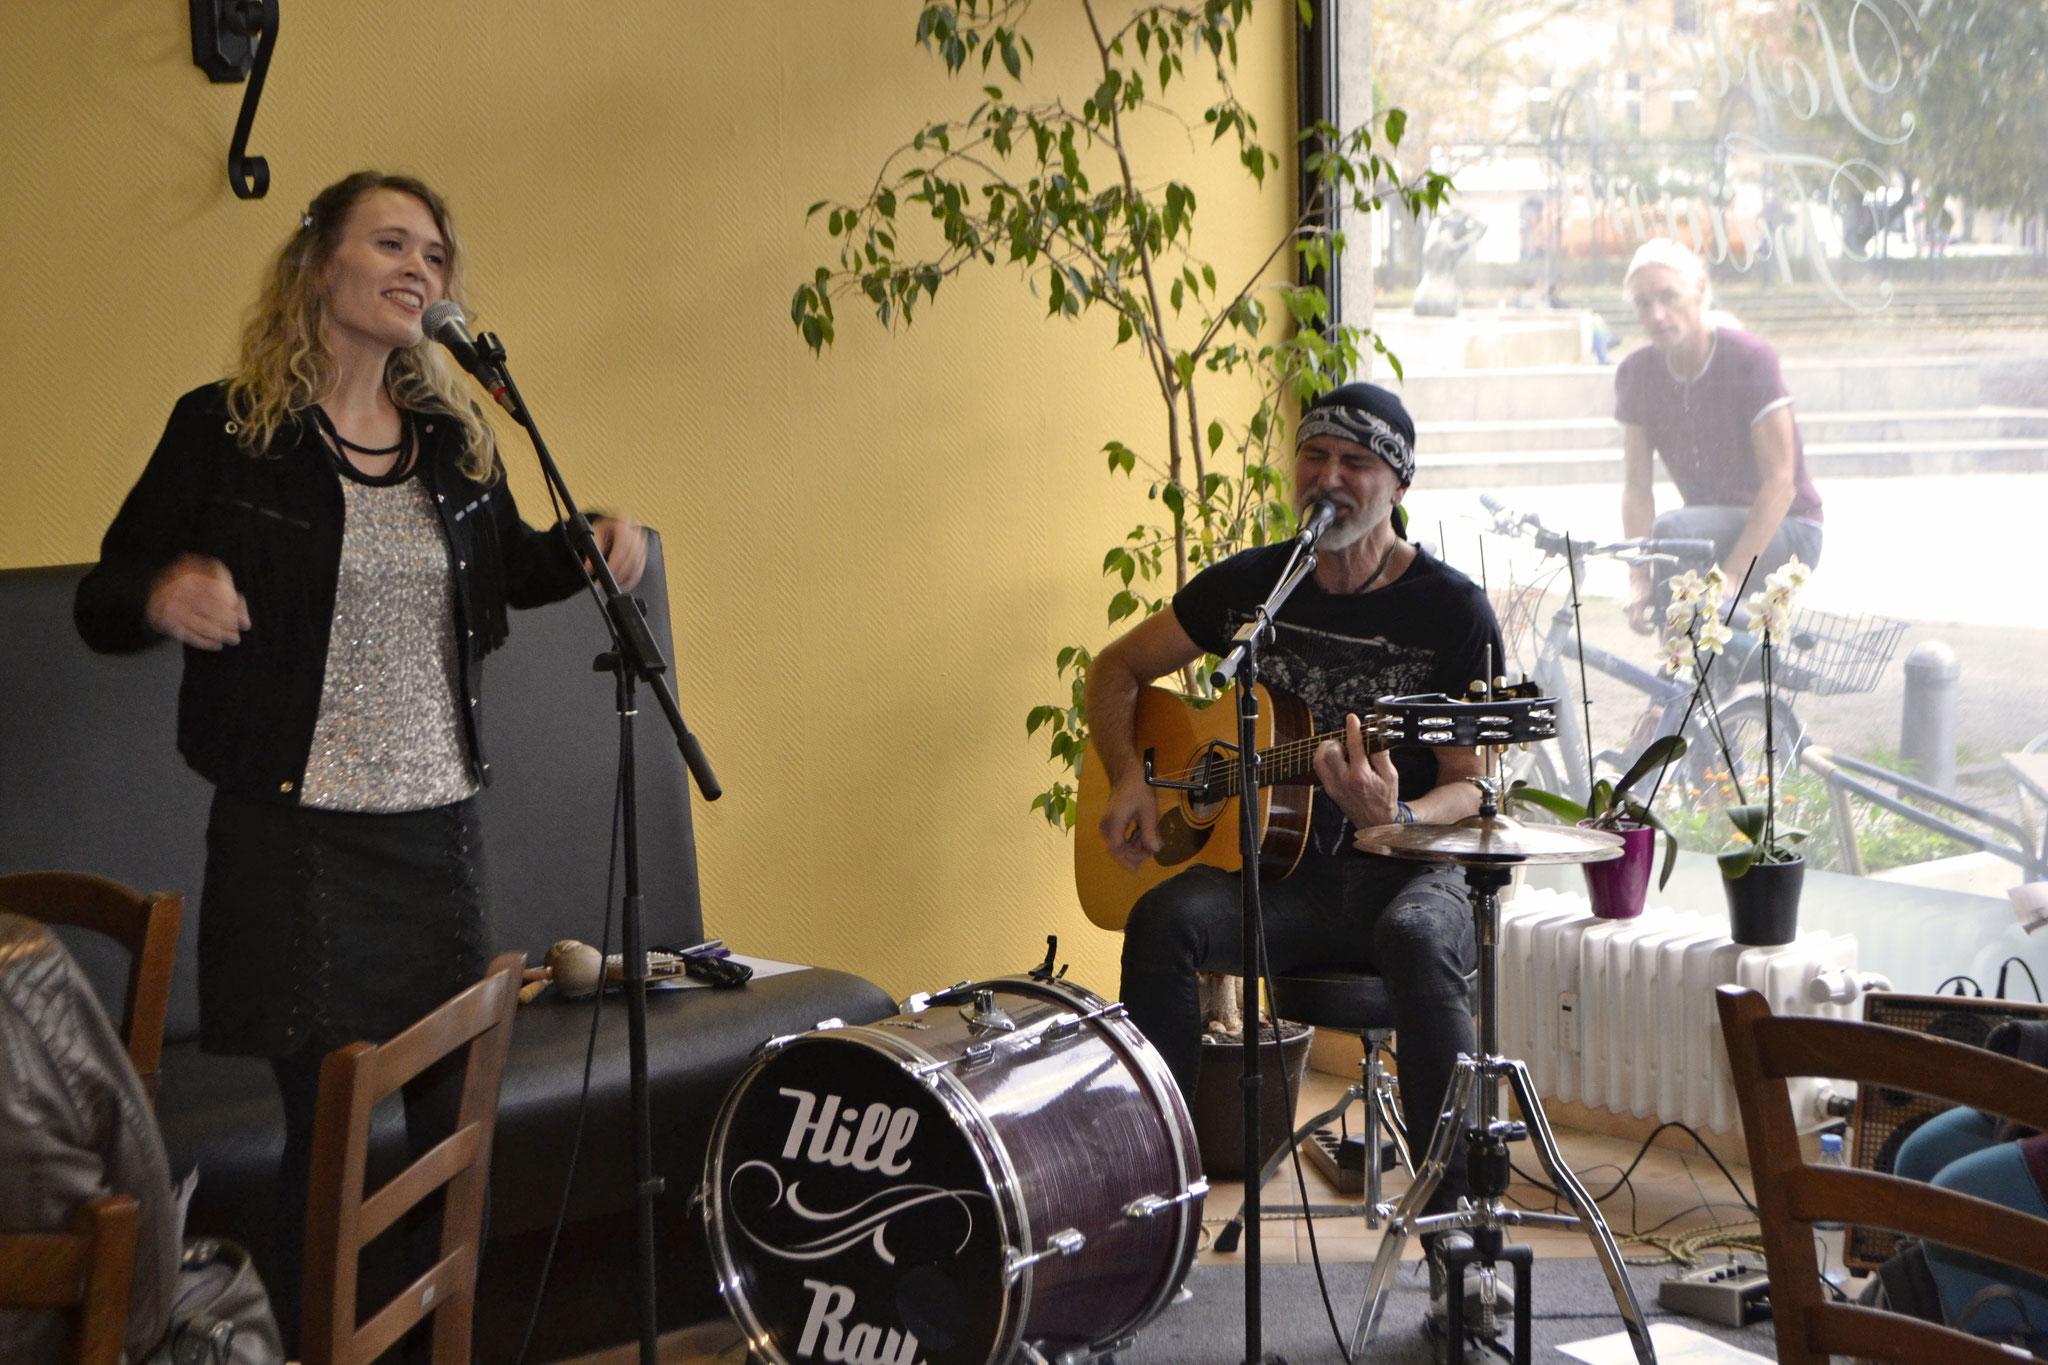 Hill & Ray im Café Torten-Träume, Foto: Florina Limberg